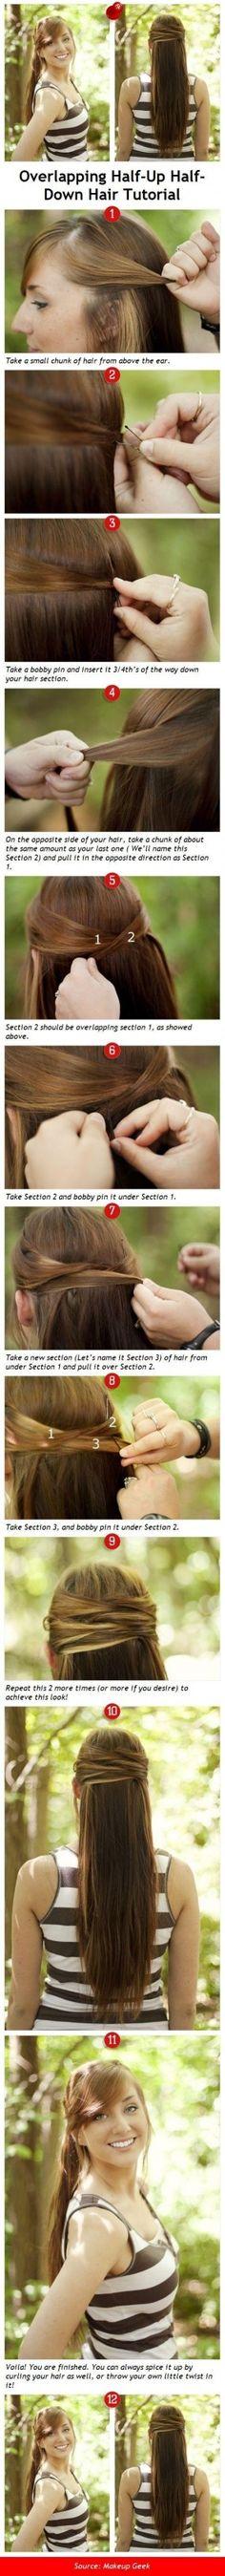 overlapping half-up half-down hair tutorial . . . #hairstyle #straight #longhair #beauty